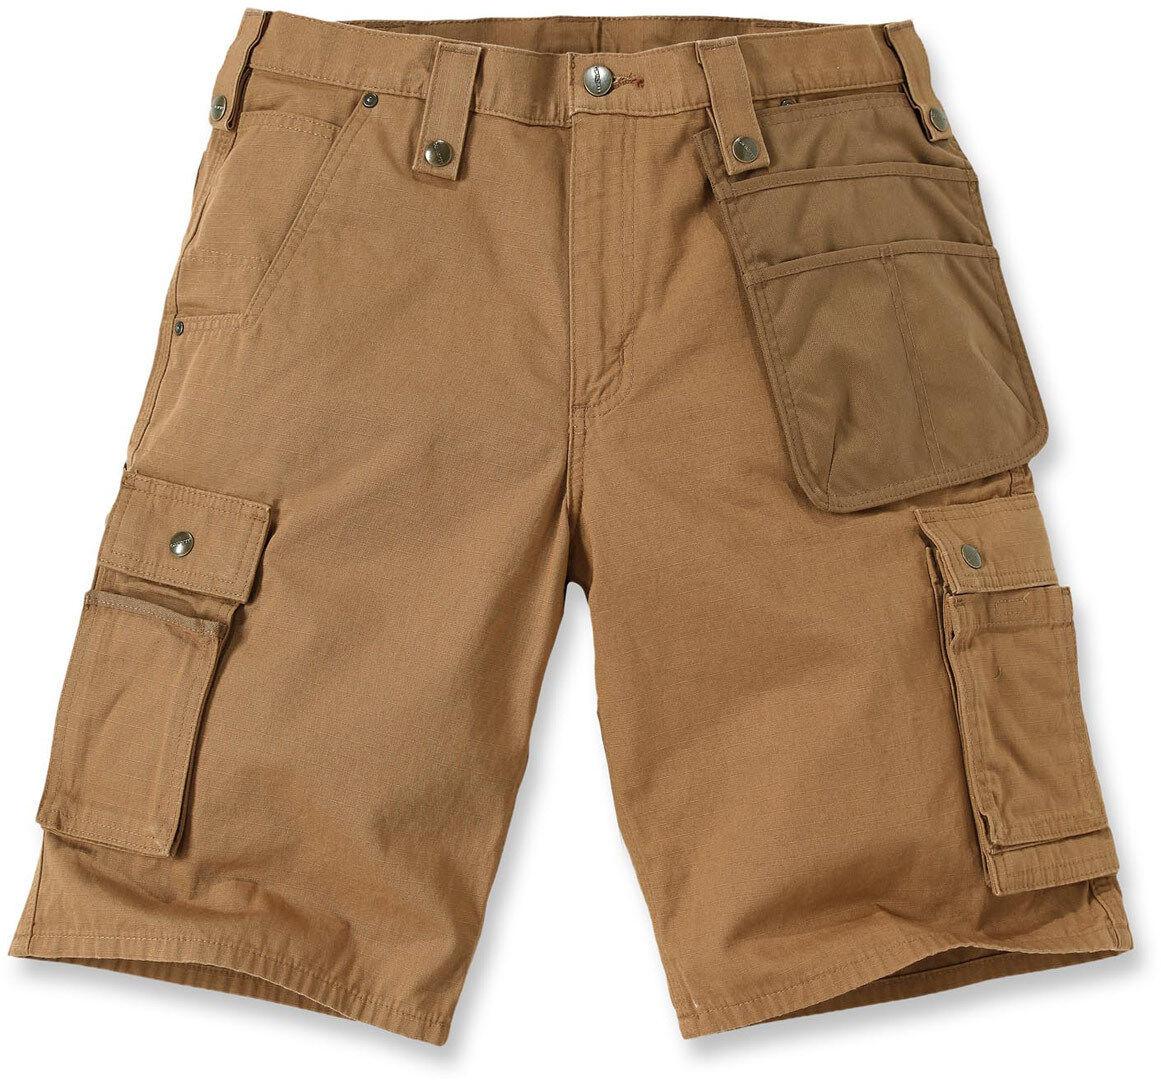 Carhartt Multi Pocket Ripstop Pantalones cortos Marrón 32